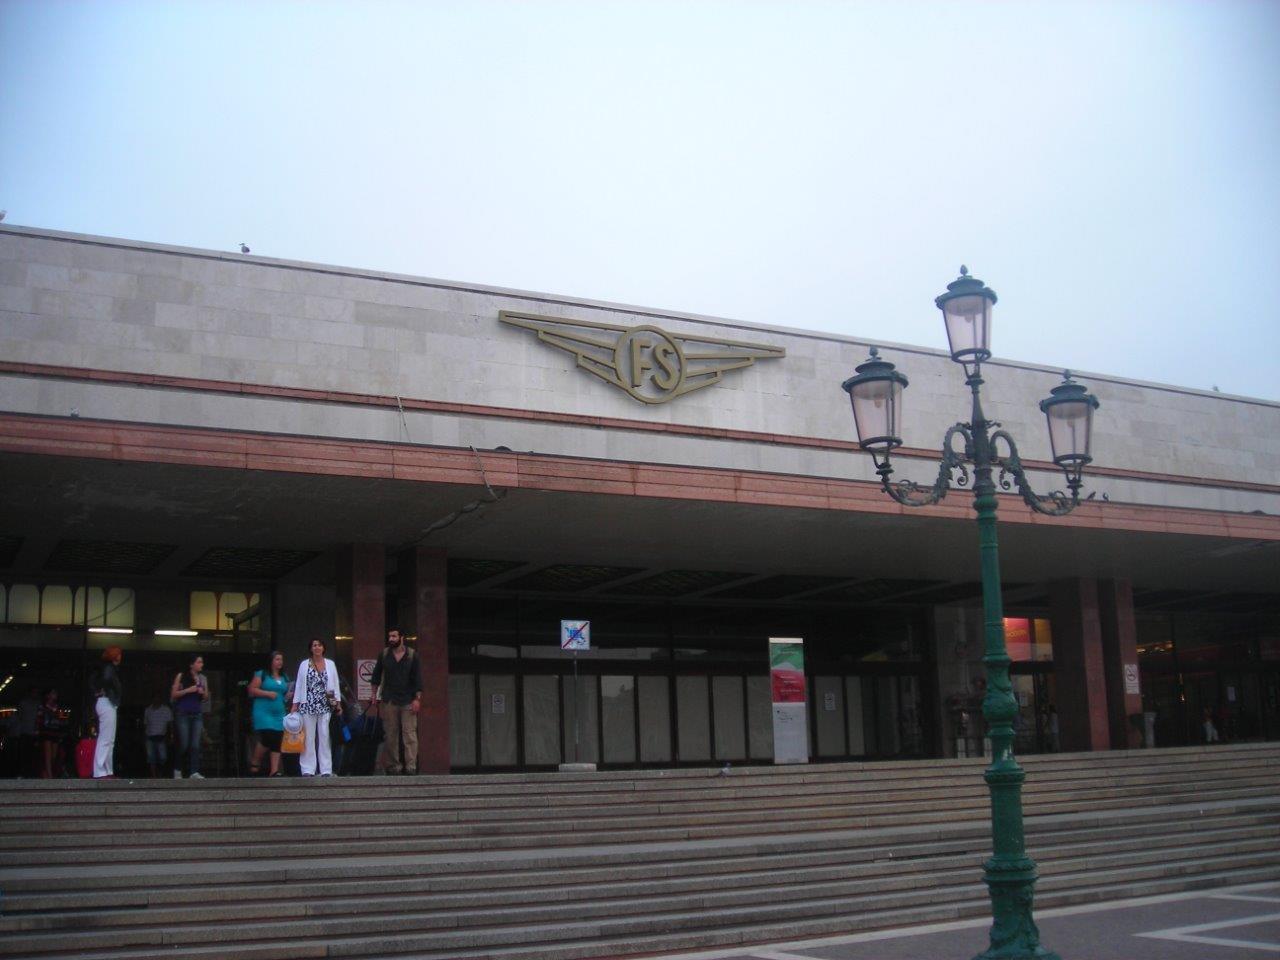 stazione-venezia-santa-lucia-railway-station